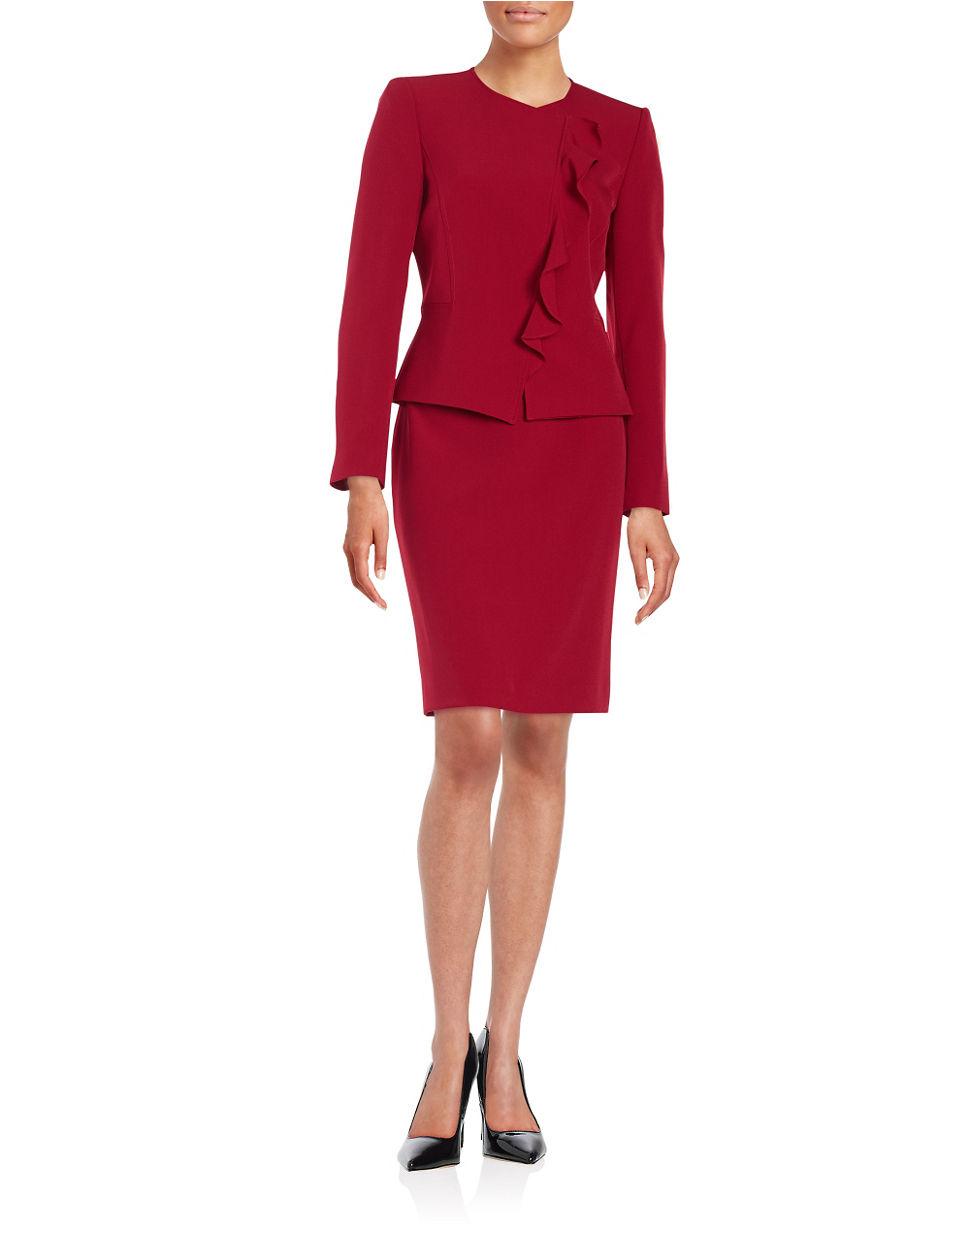 Designer Women S Skirt Suits